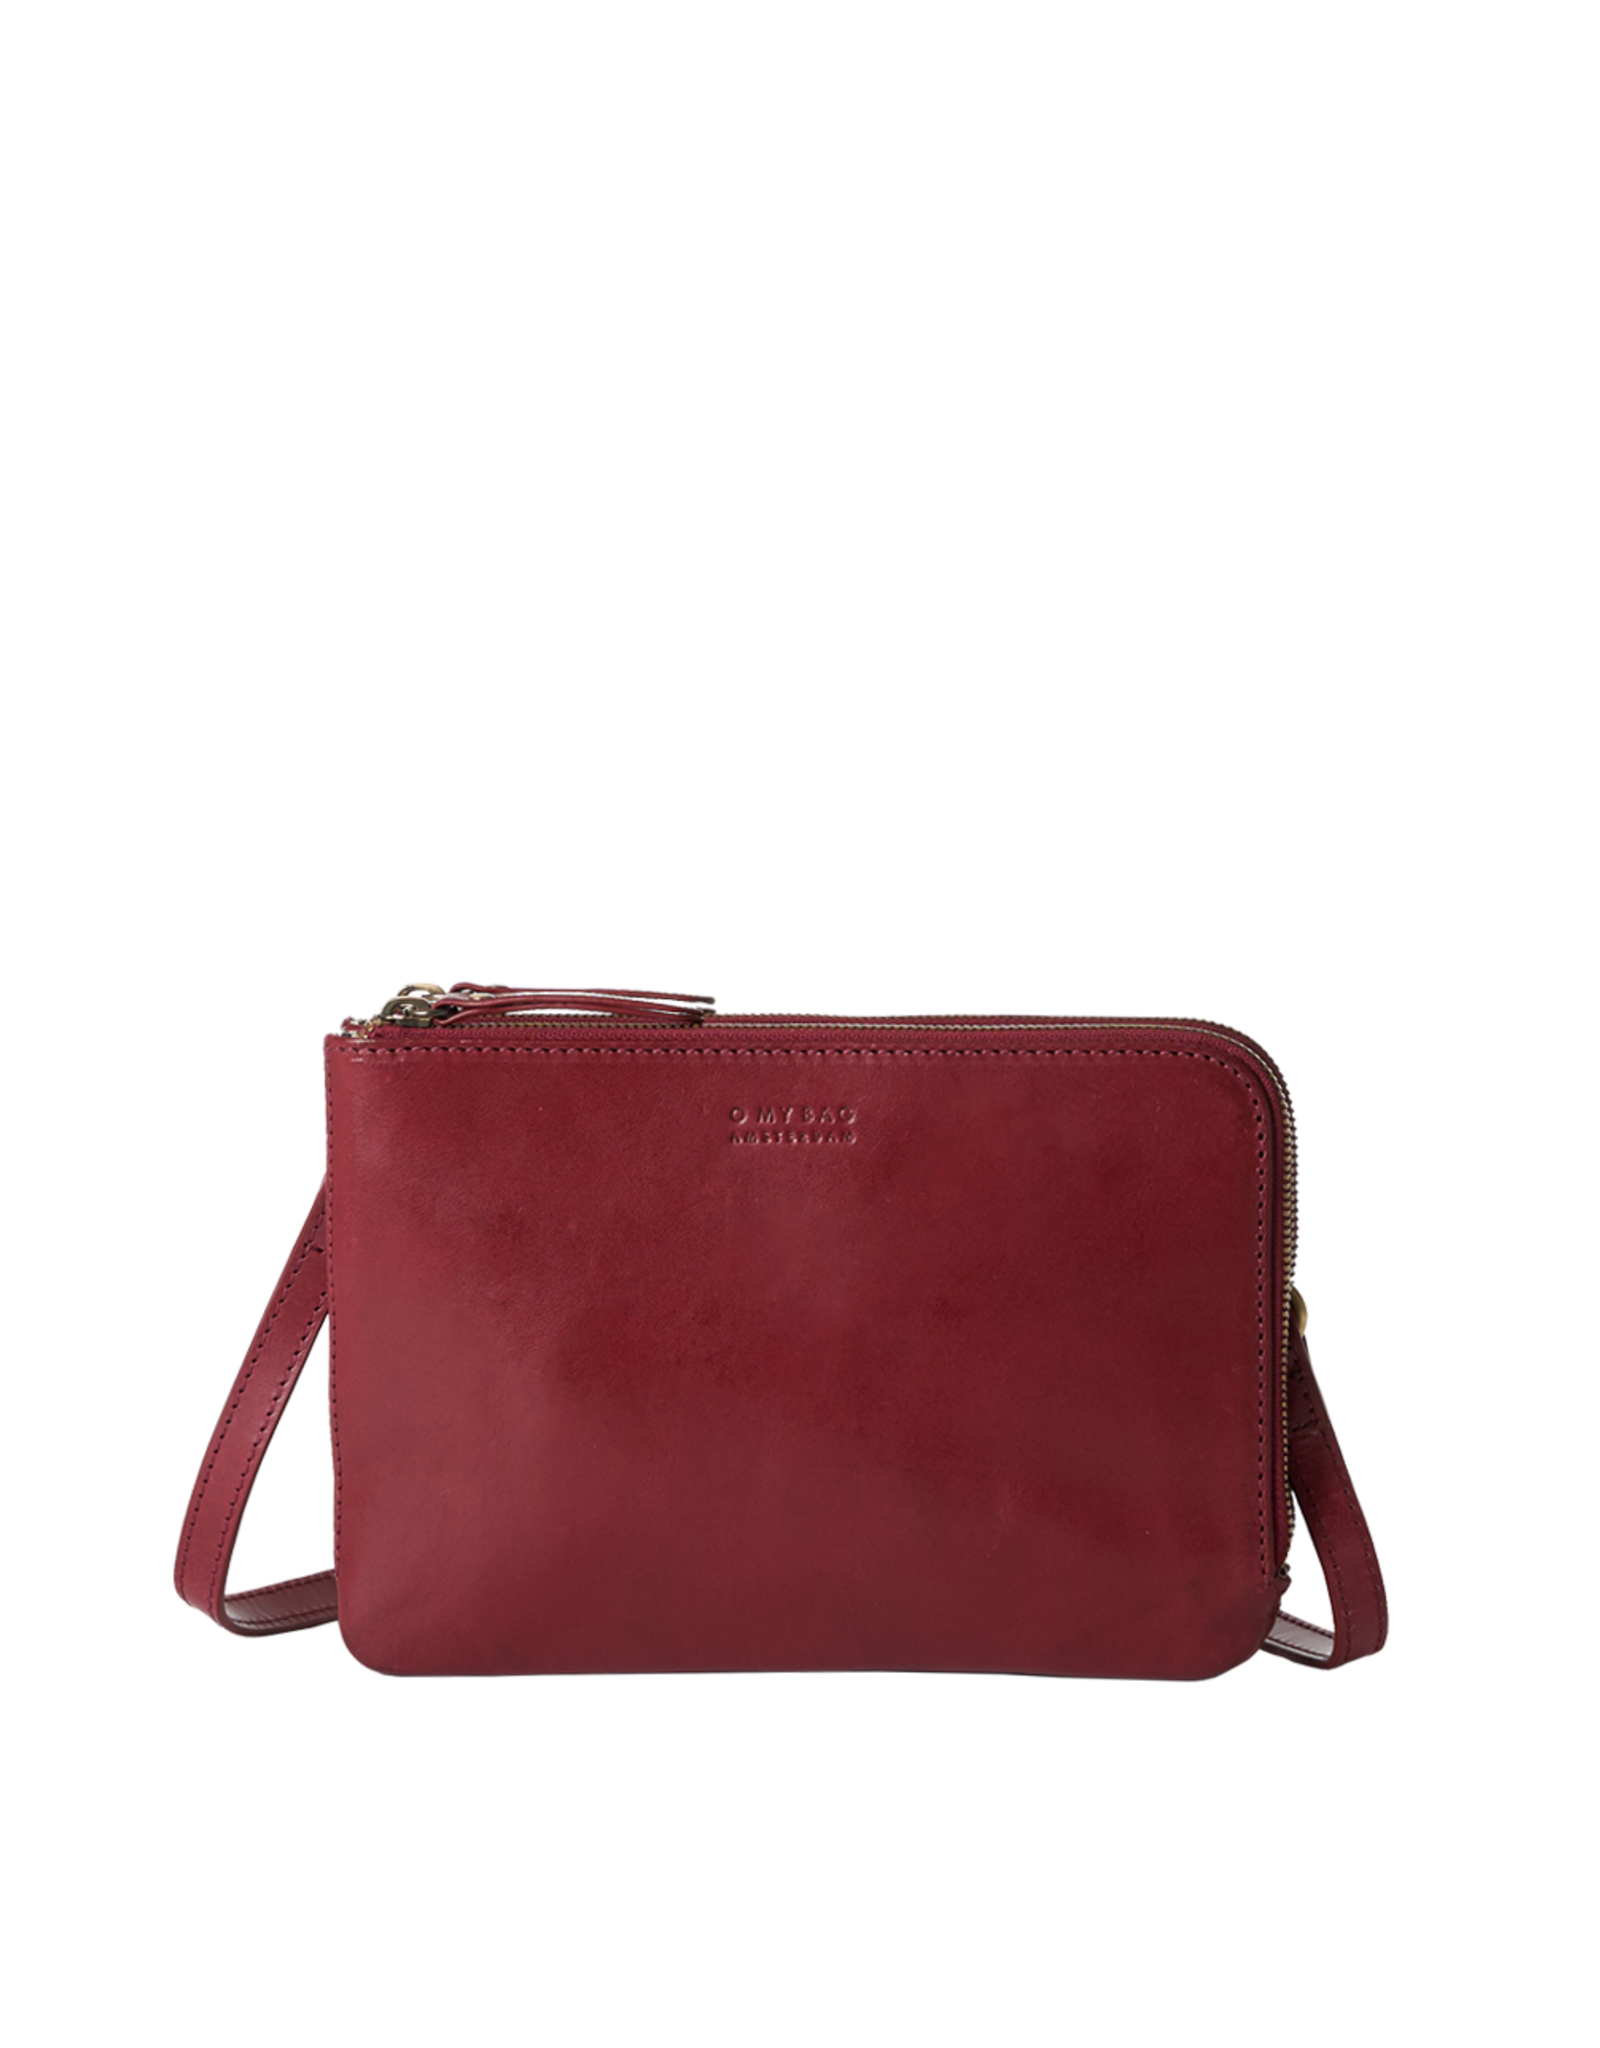 O MY BAG Cross-body bag / clutch - Lola